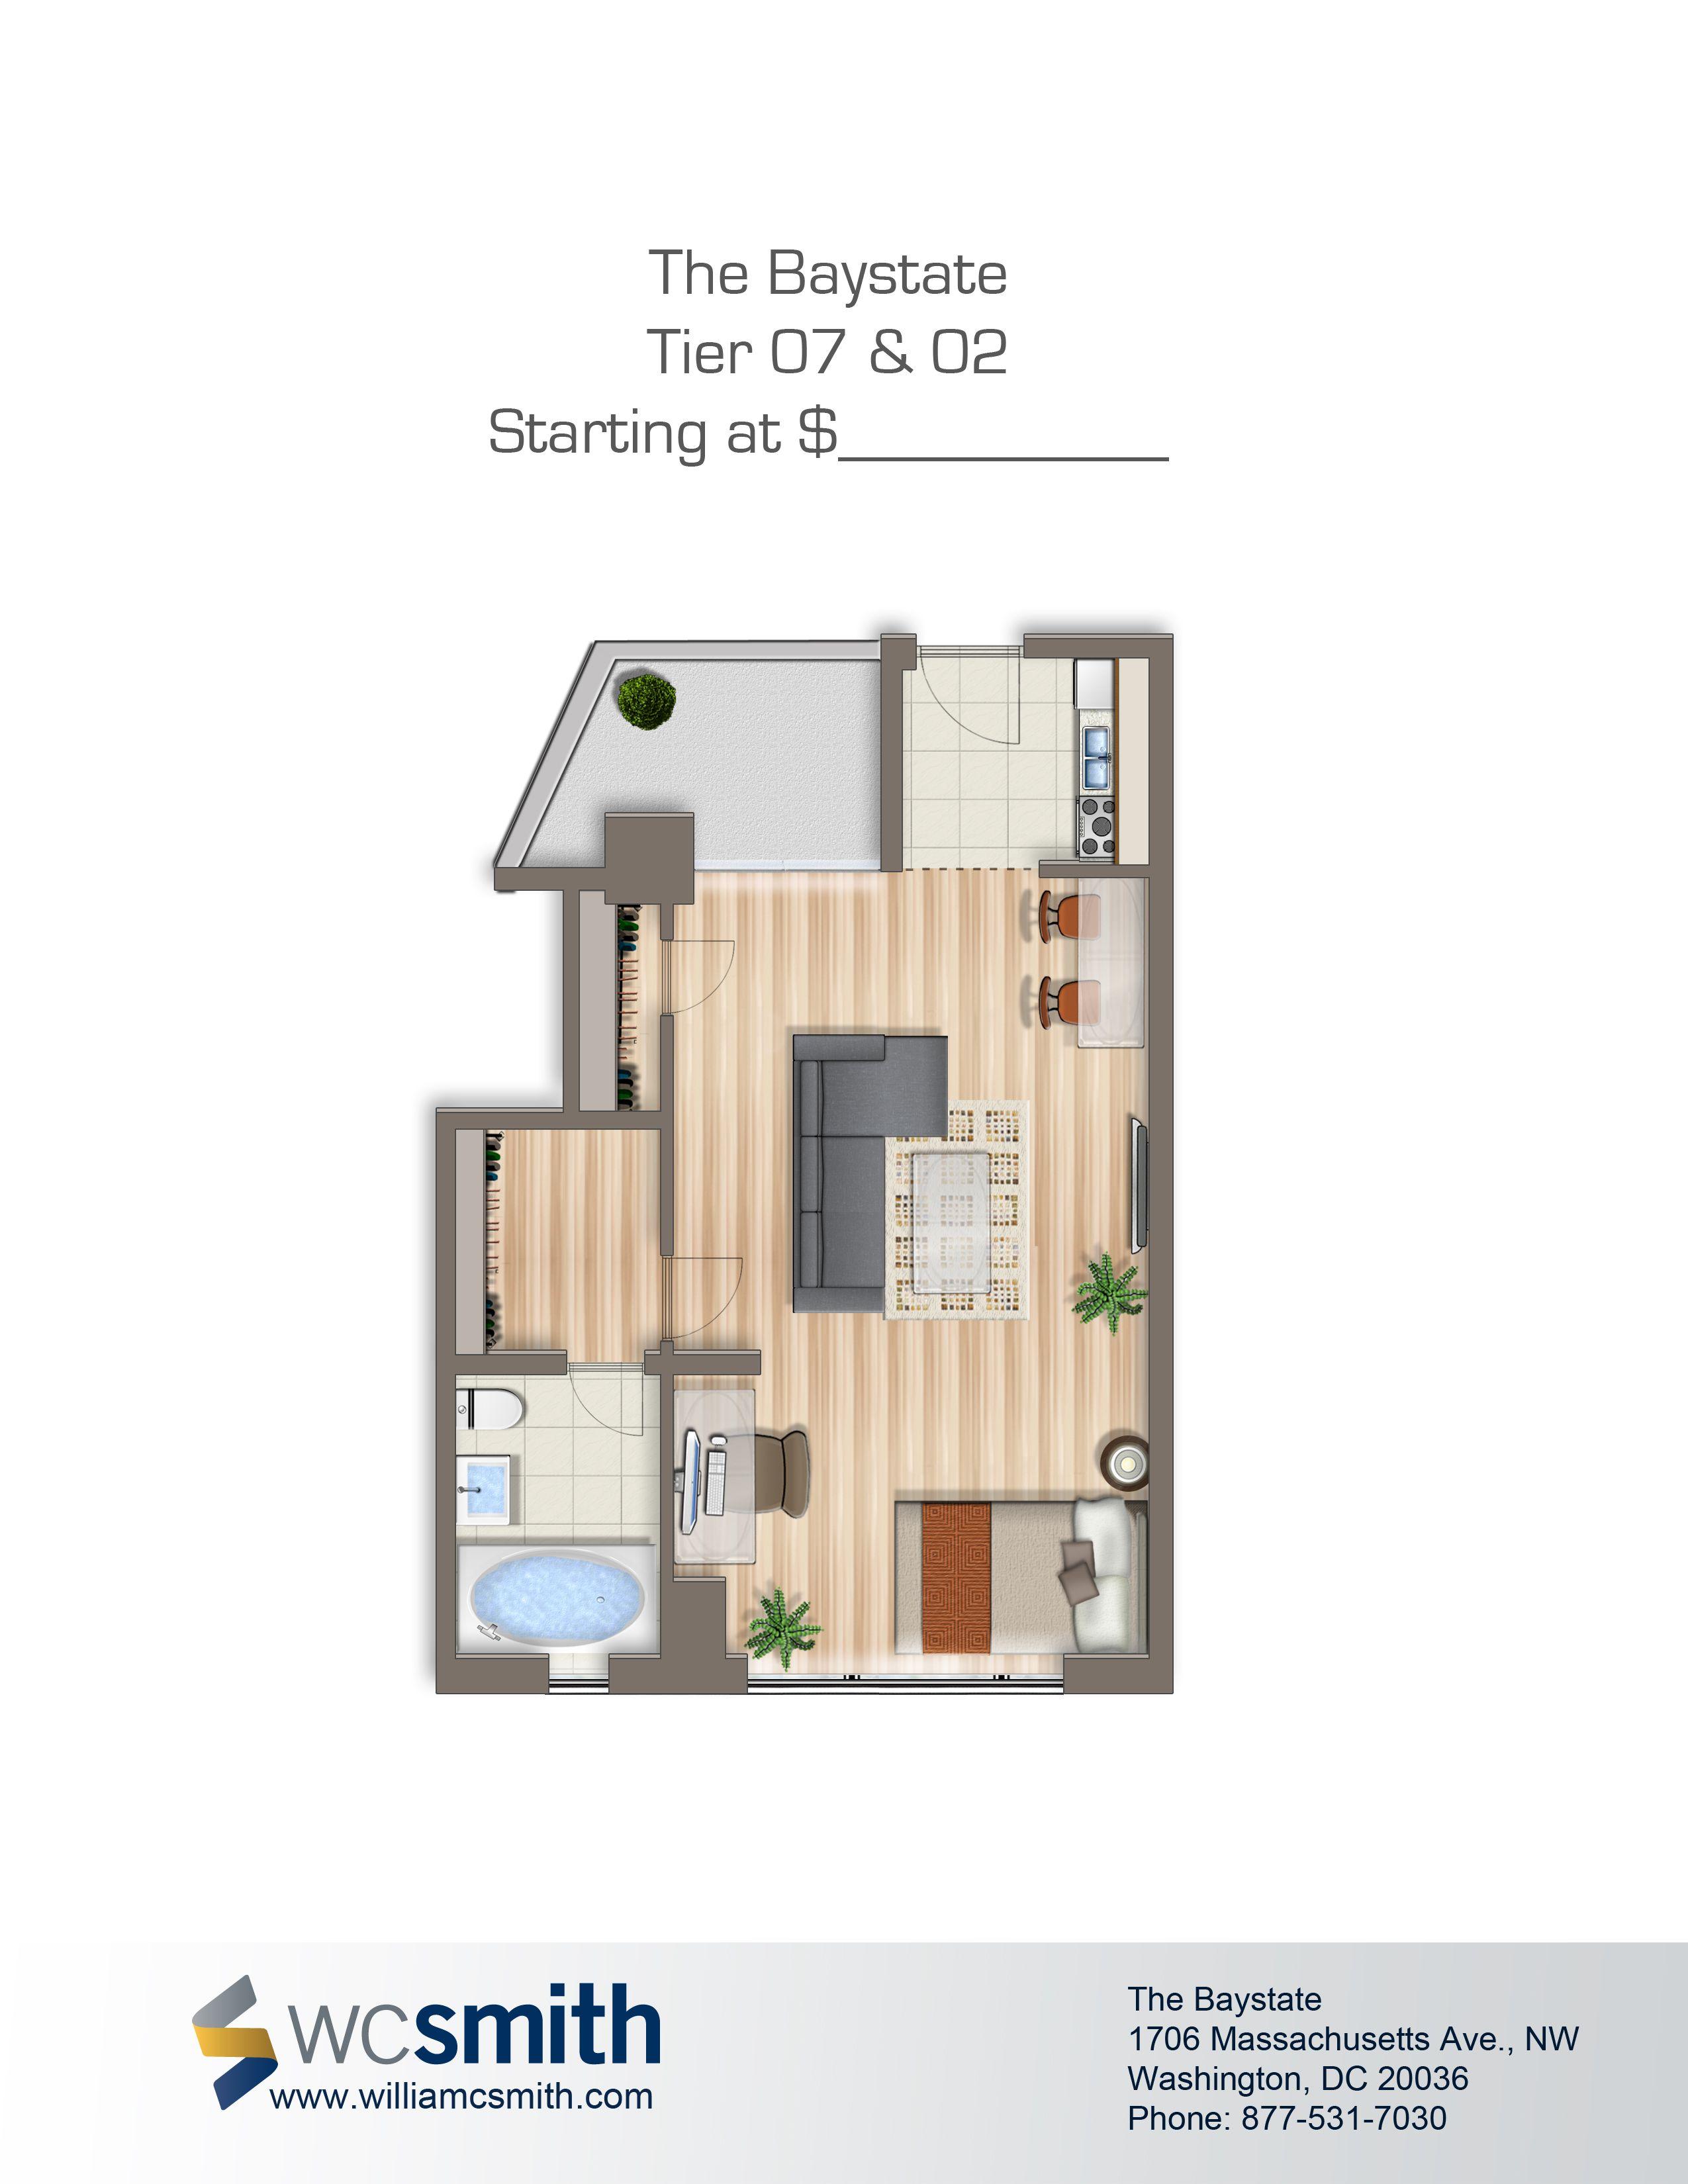 Baystate Apartments. Moving HomeWashington DcFloor PlansApartments